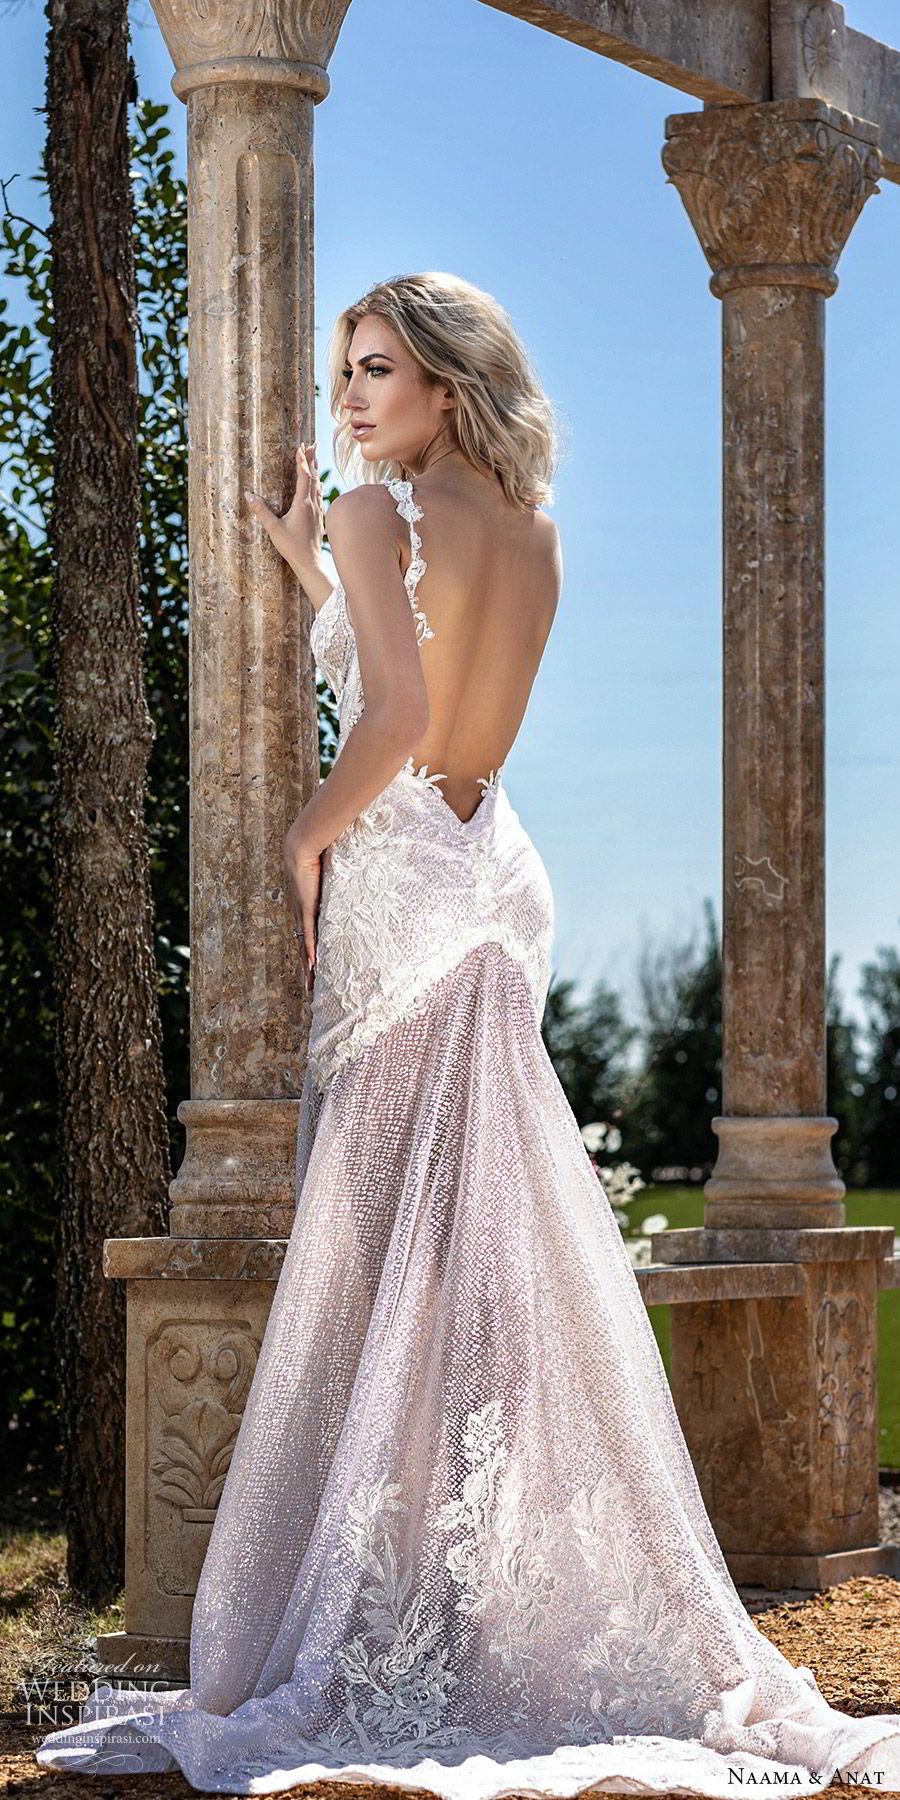 naama anat spring 2020 bridal sleeveless deep v neckline fit flare mermaid wedding dress (7) mv sheer low back chapel train sexy glamorours blush bv